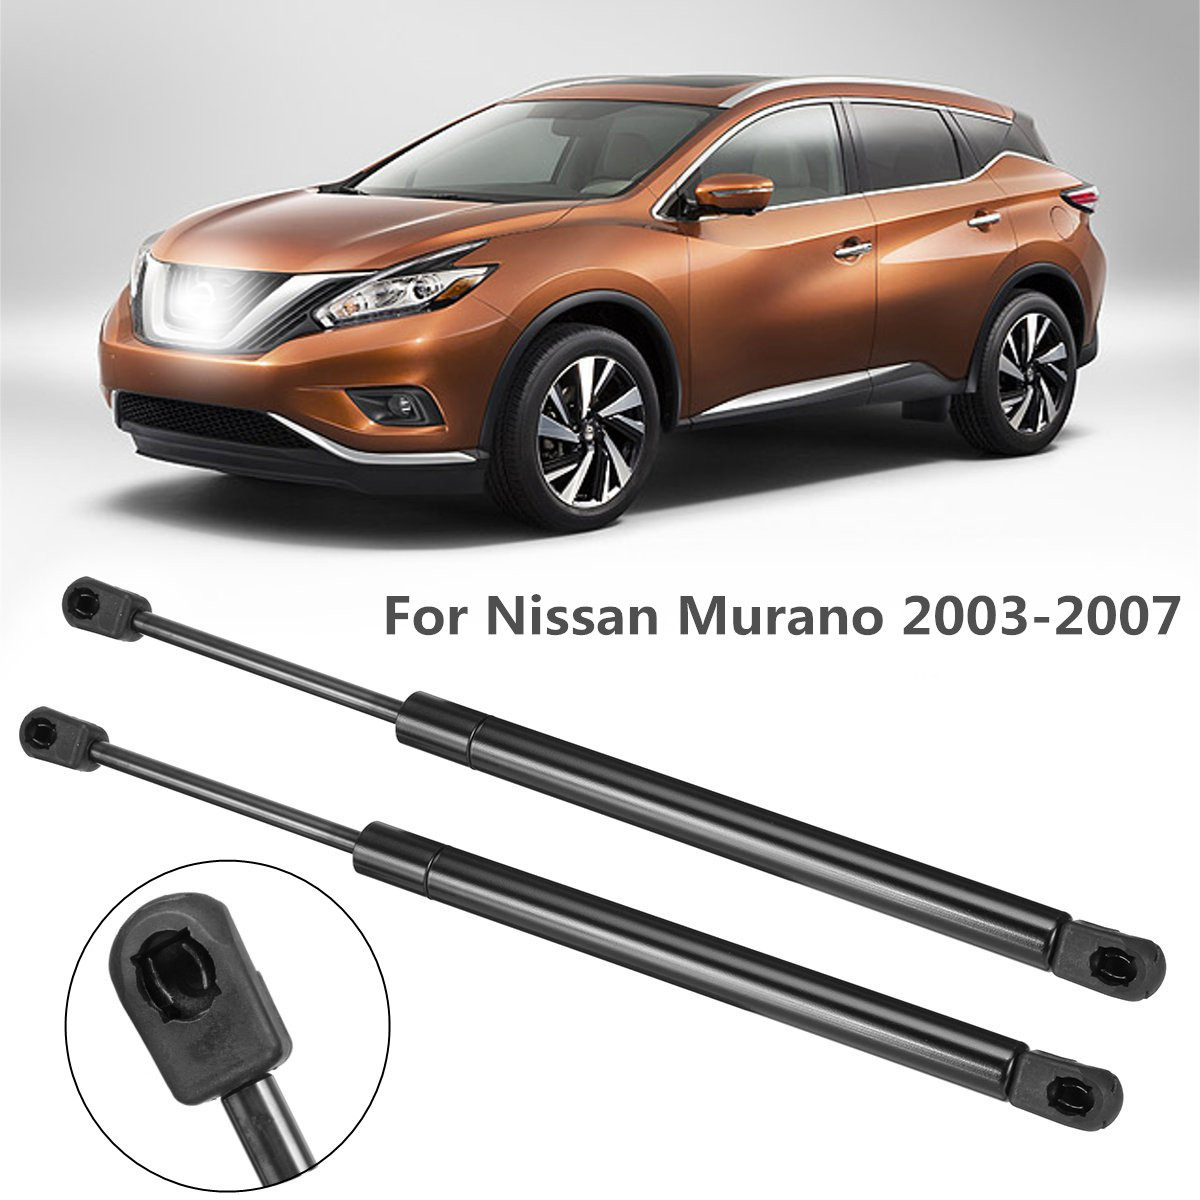 MYSMOT 2Pcs Front Hood Lift Supports Struts Shocks Spring Dampers For Nissan Murano 2003-2007 Hood 6328,SG325019,65471CA000